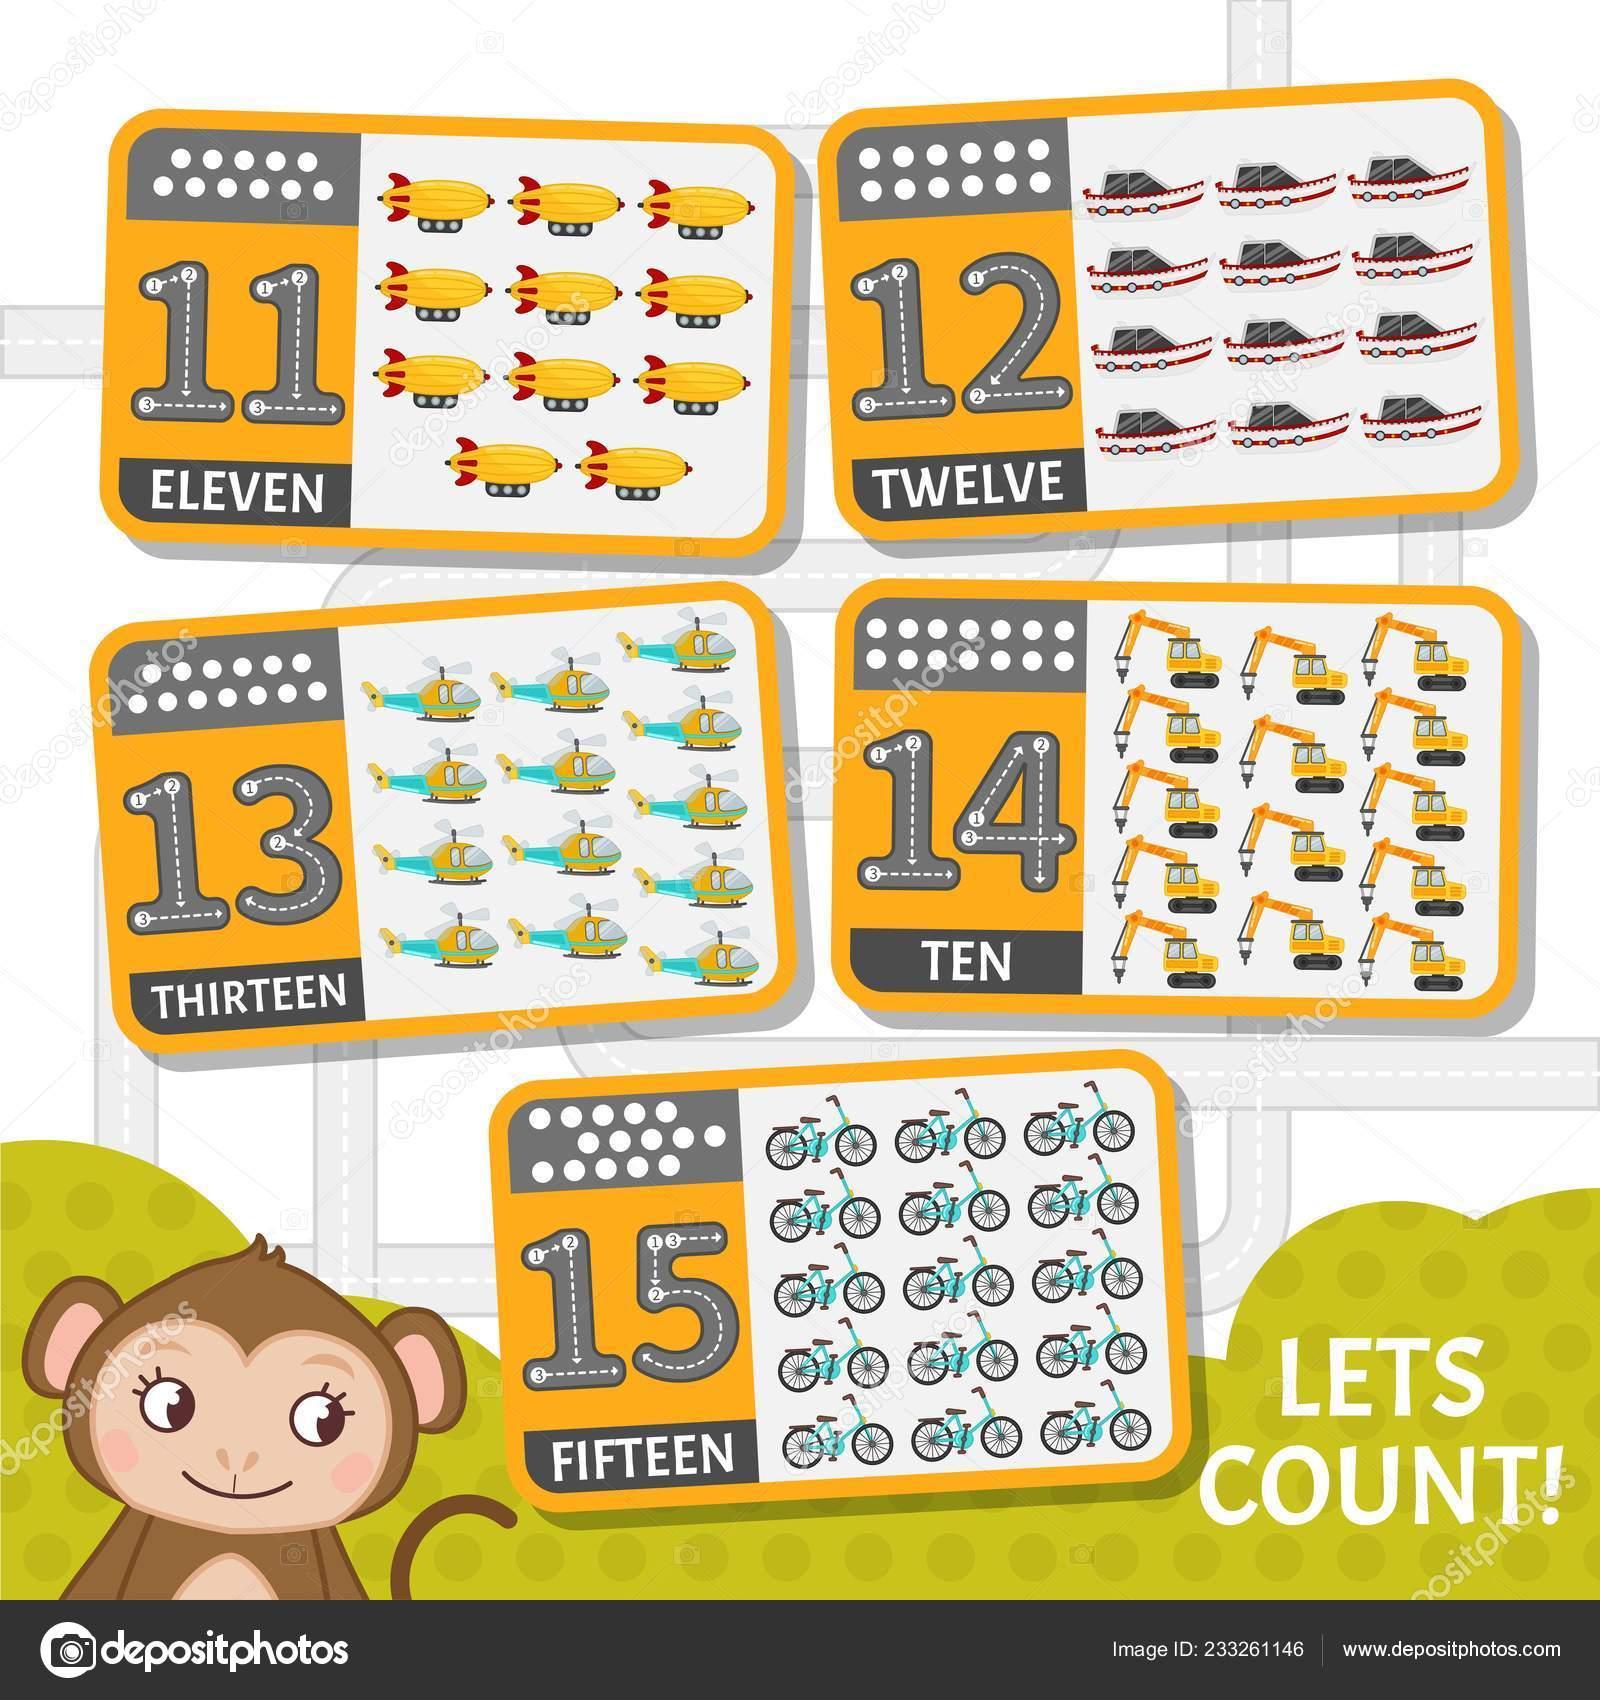 Material Aprendizaje Los Niños Tarjeta Para Aprendizaje Los Números